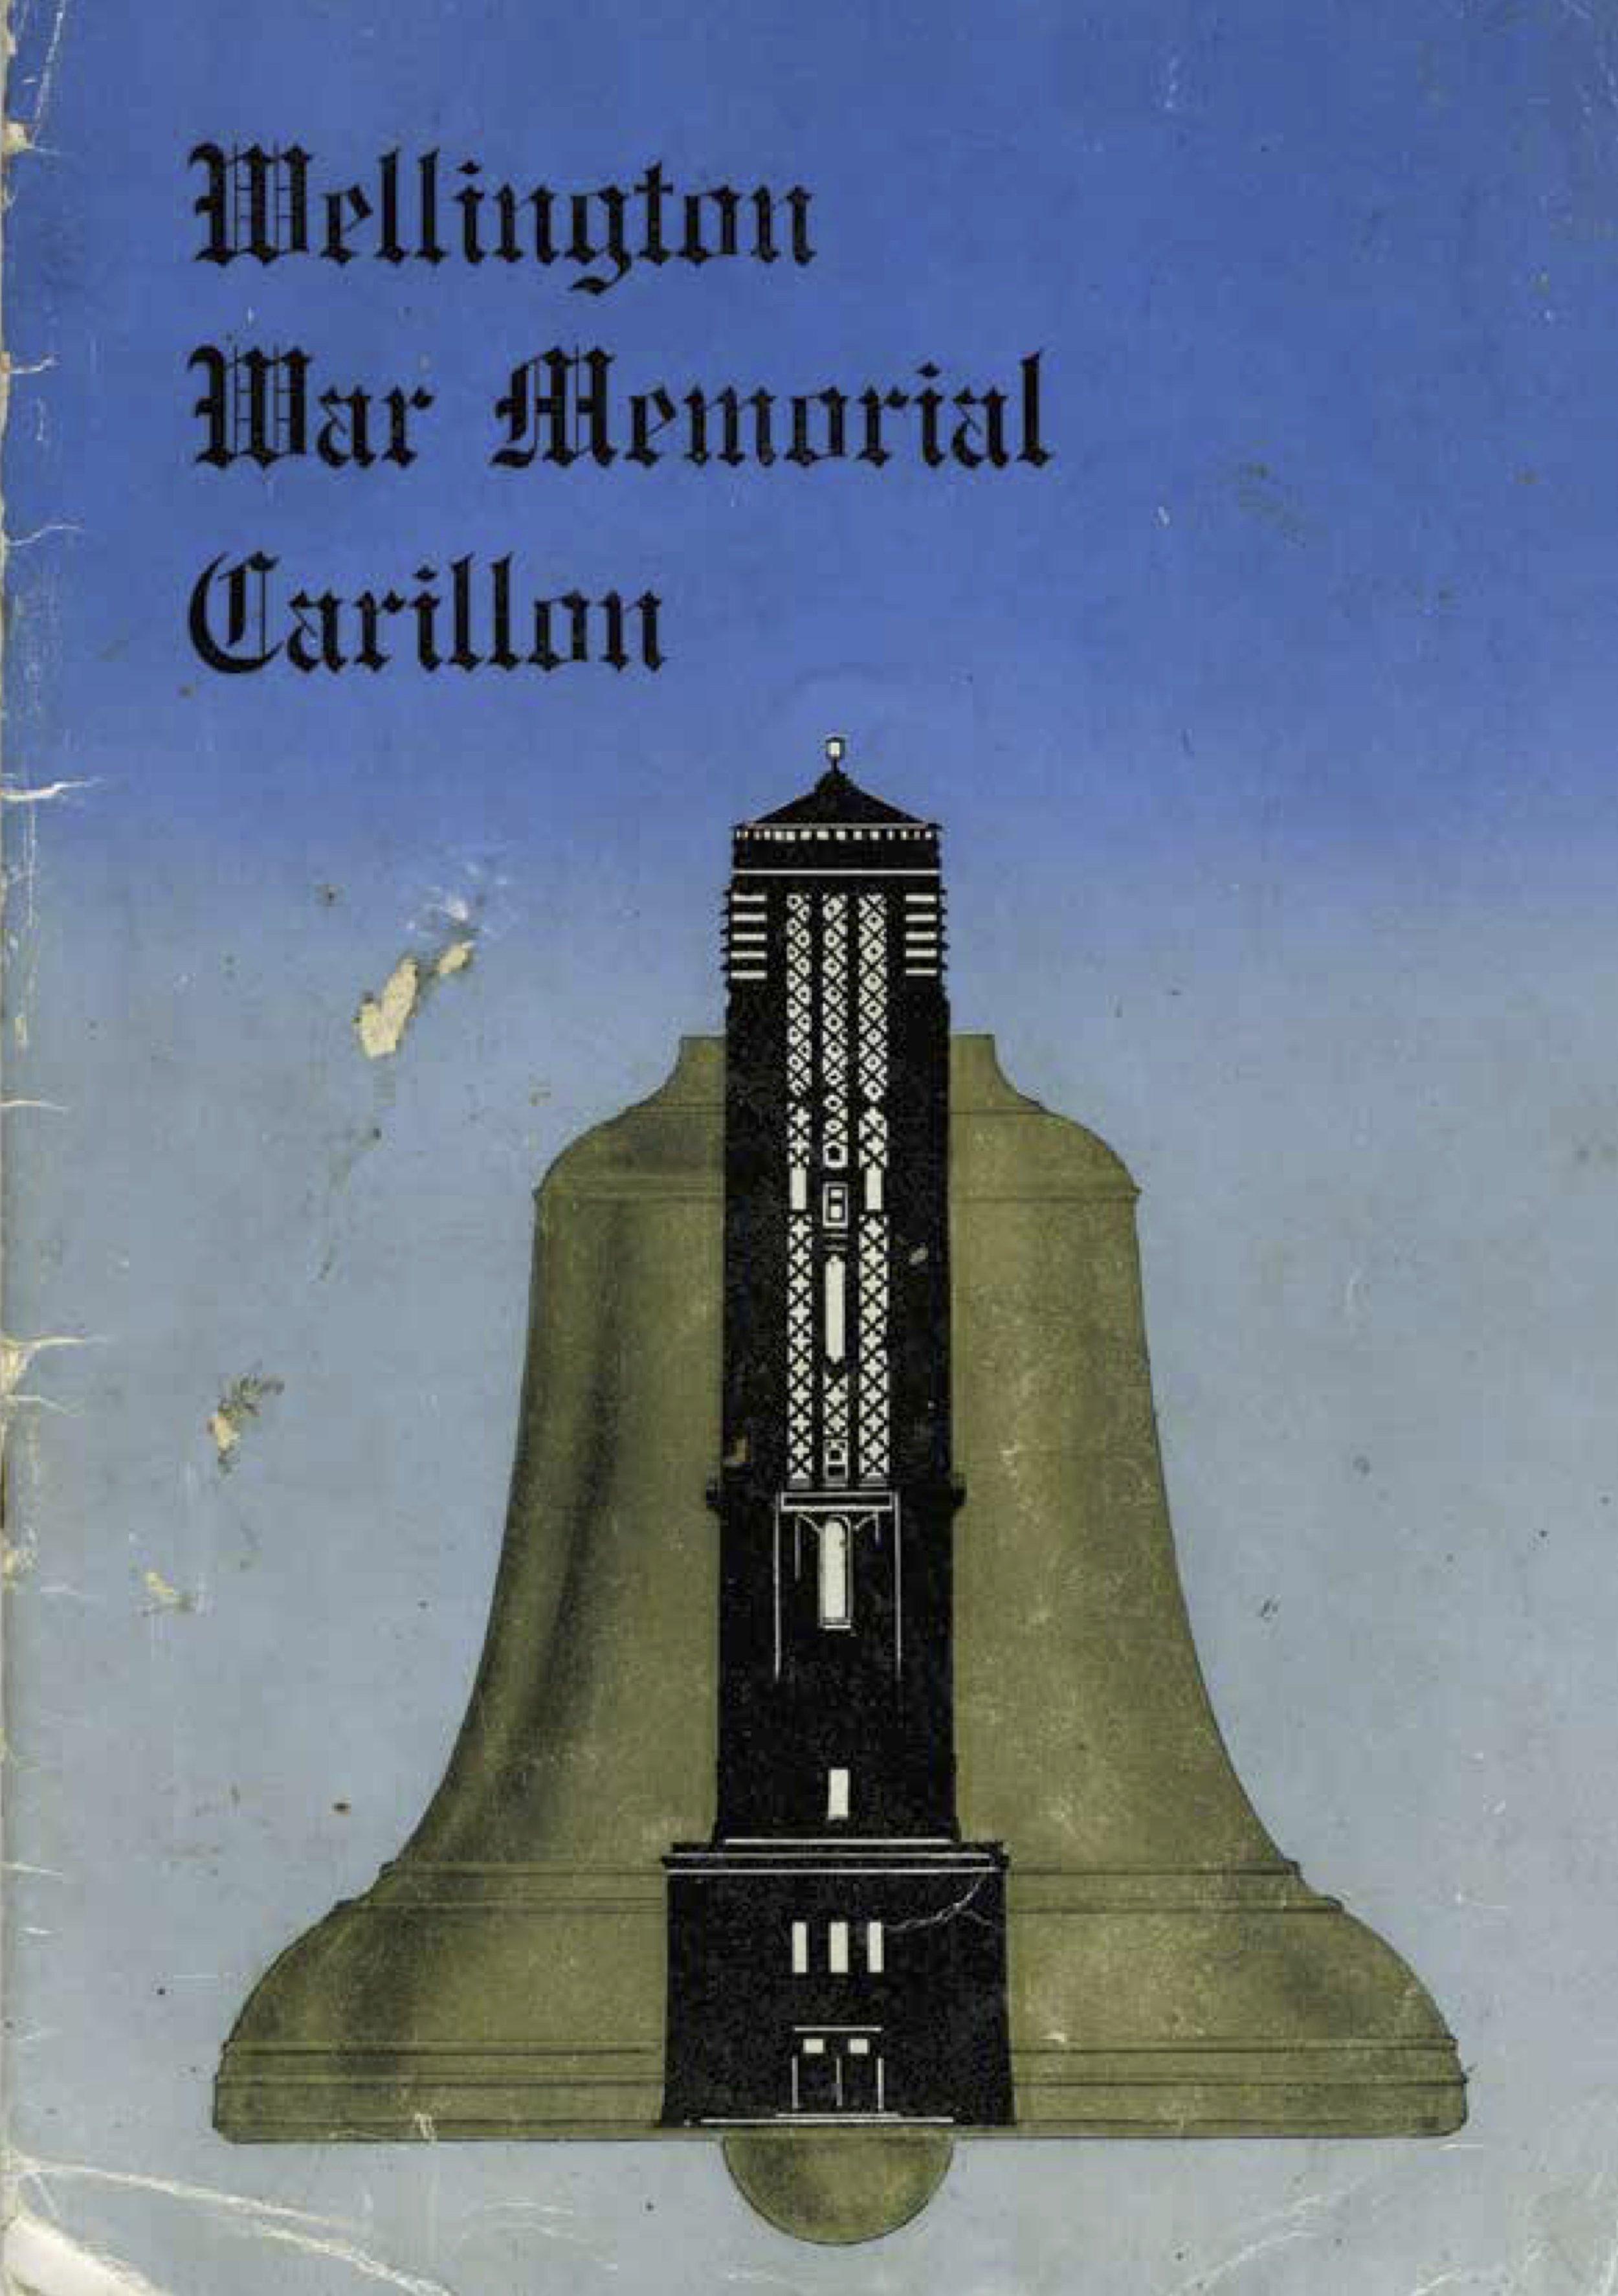 Leslie's memorial bell